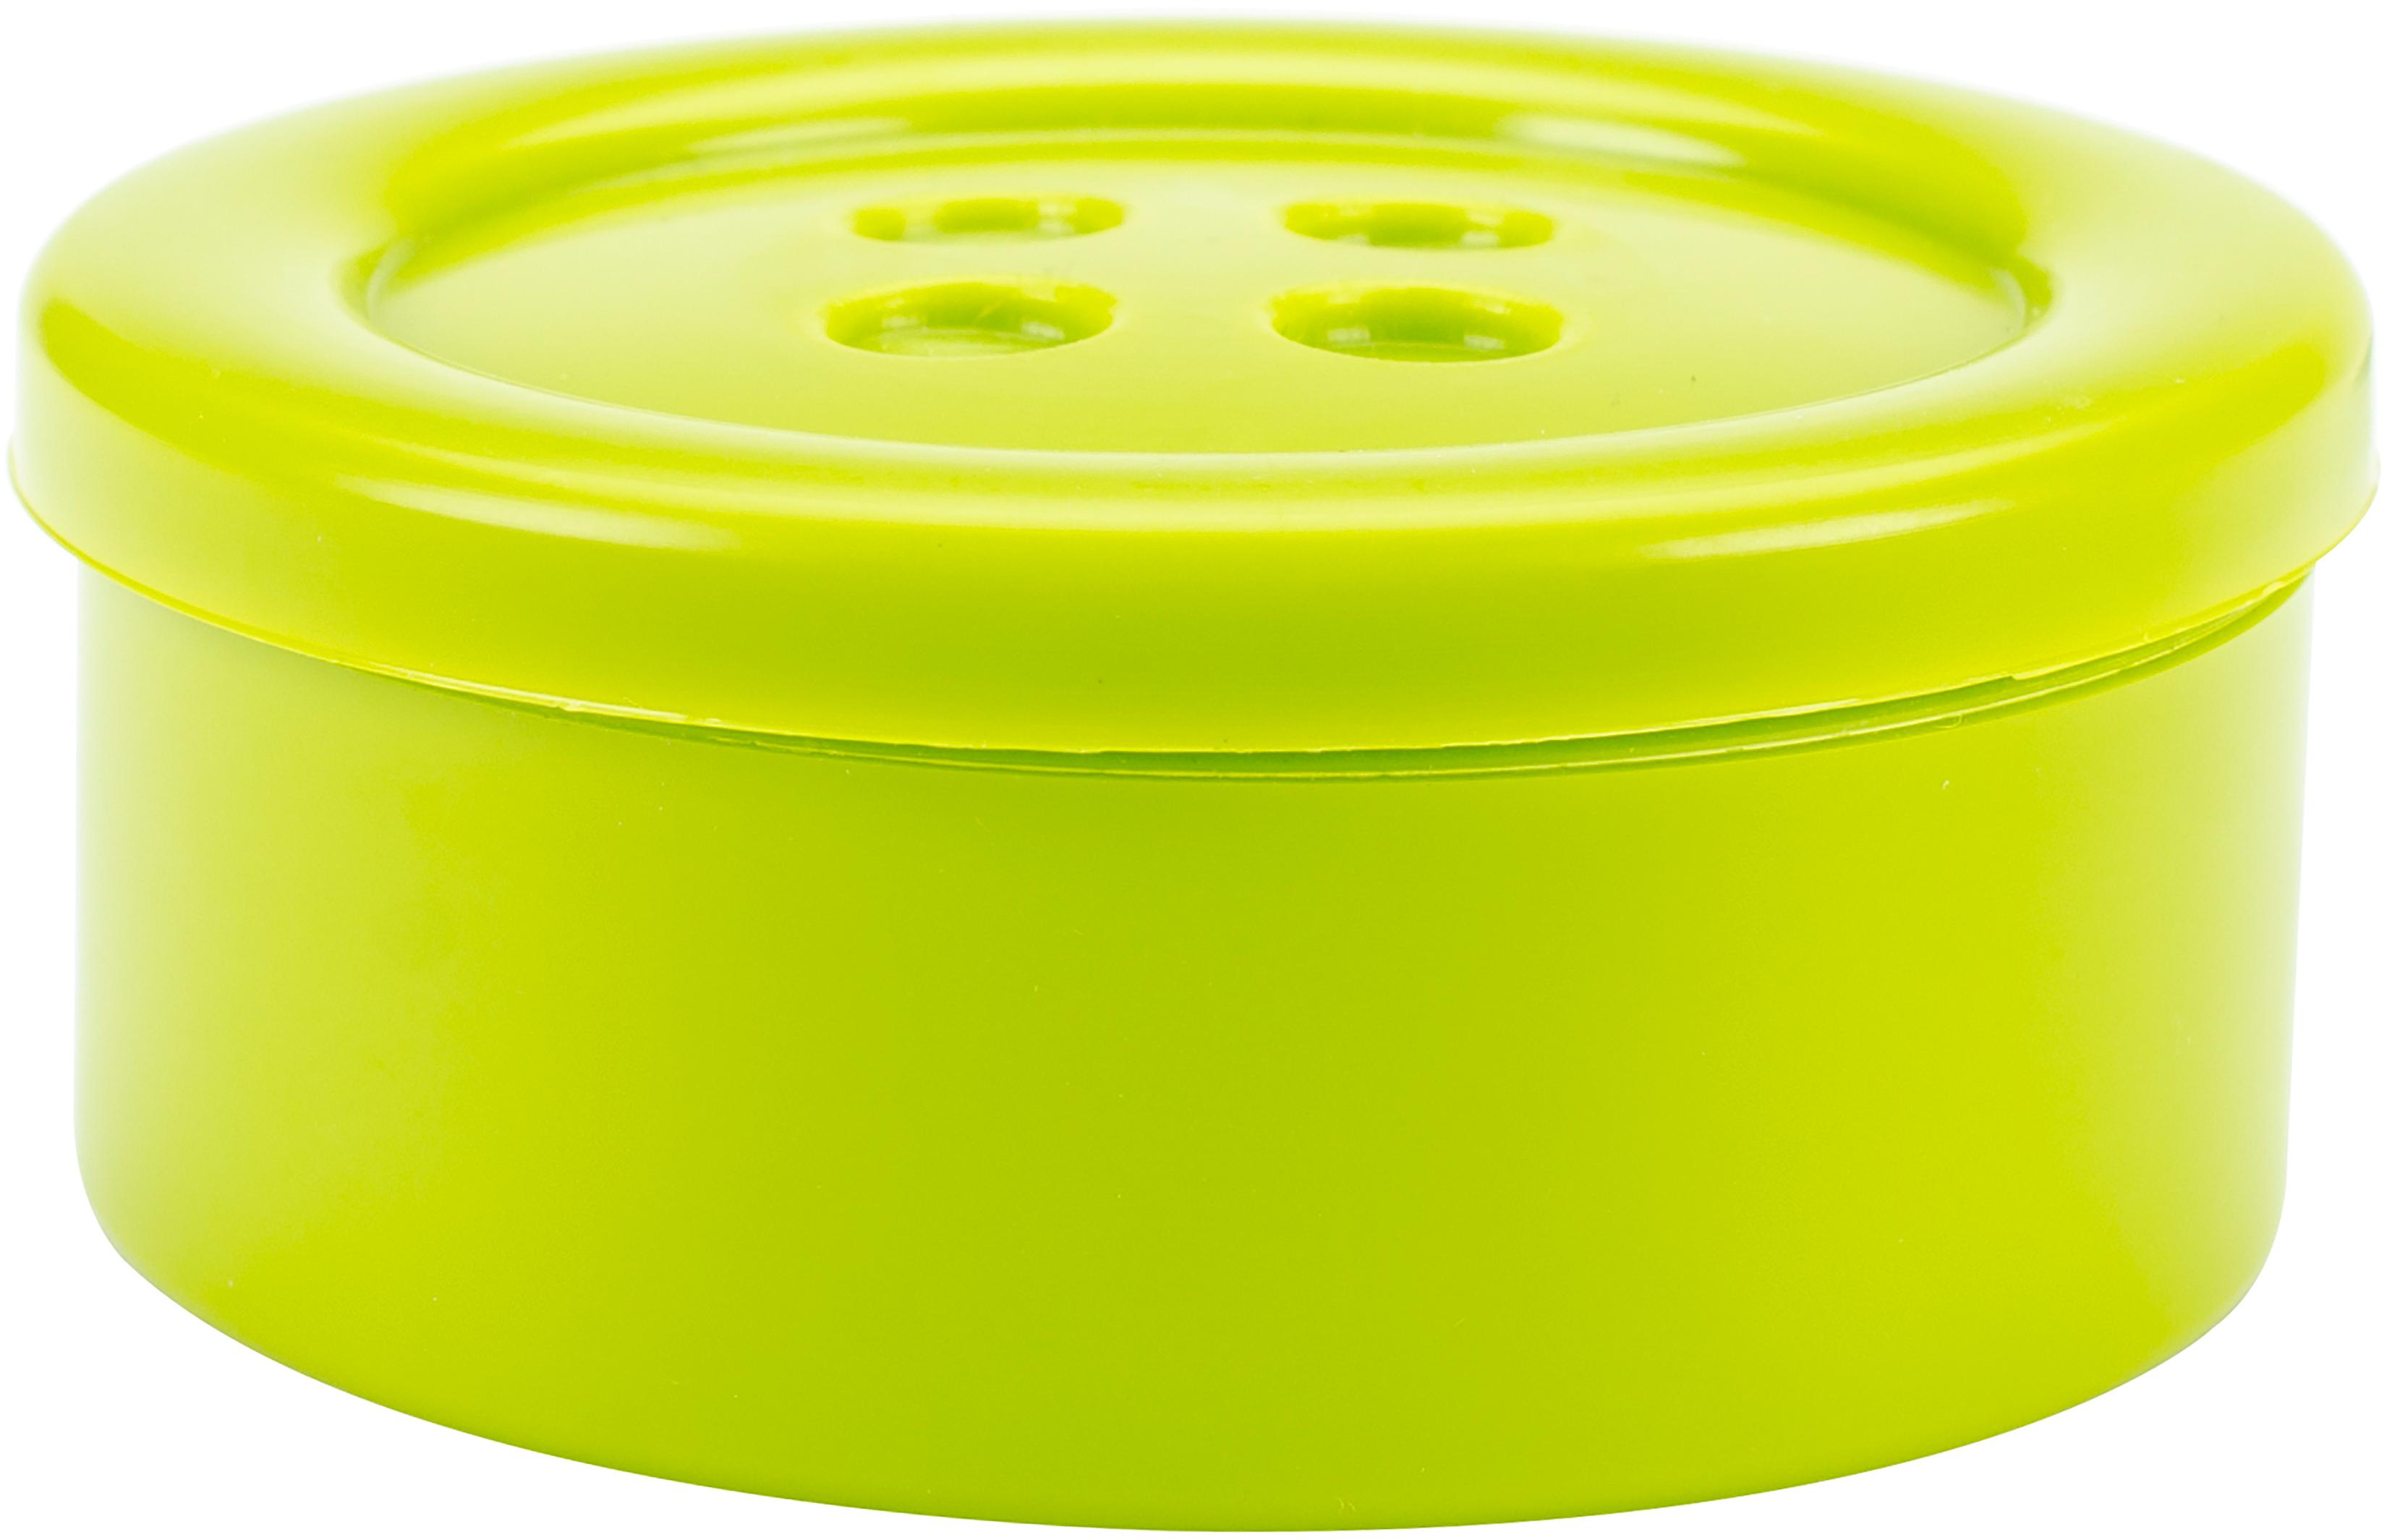 Blumenthal Lansing Button Shaped Storage Box 3.25-Lime - Small